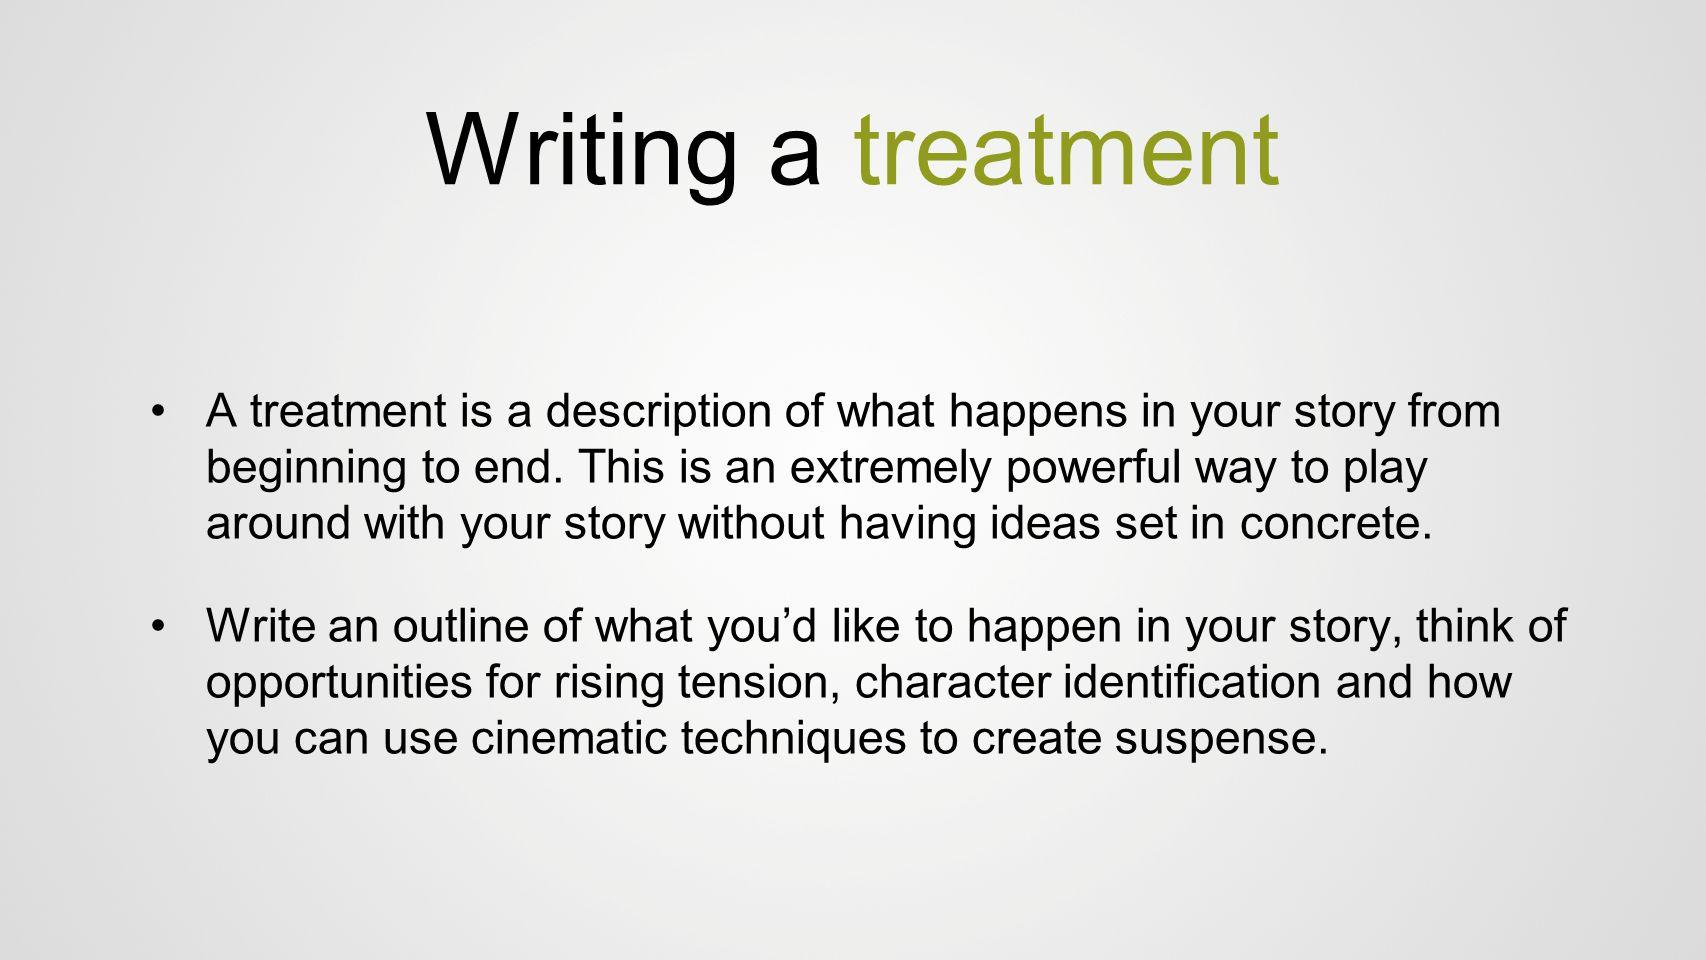 Writing a treatment